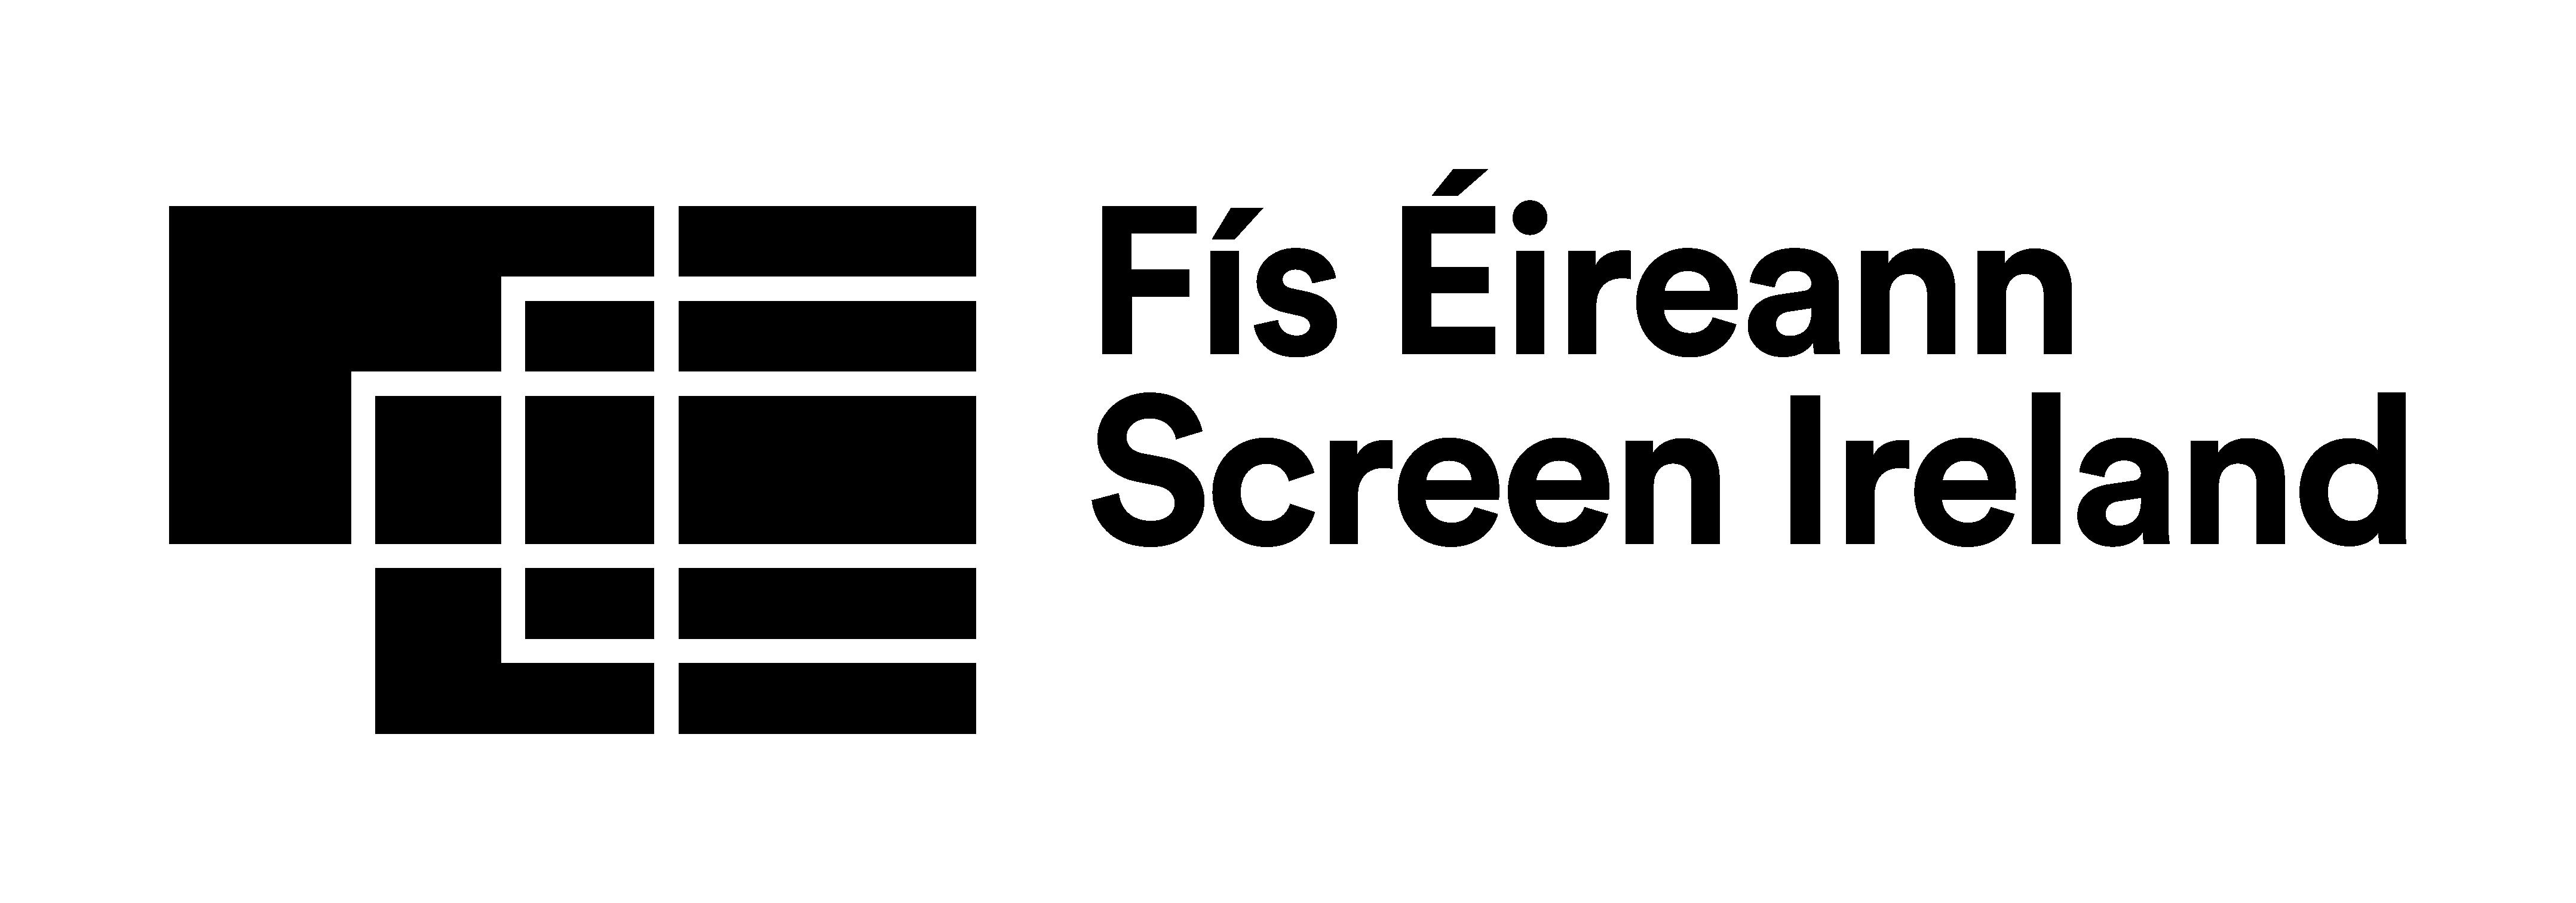 ScreenIreland_Black-01